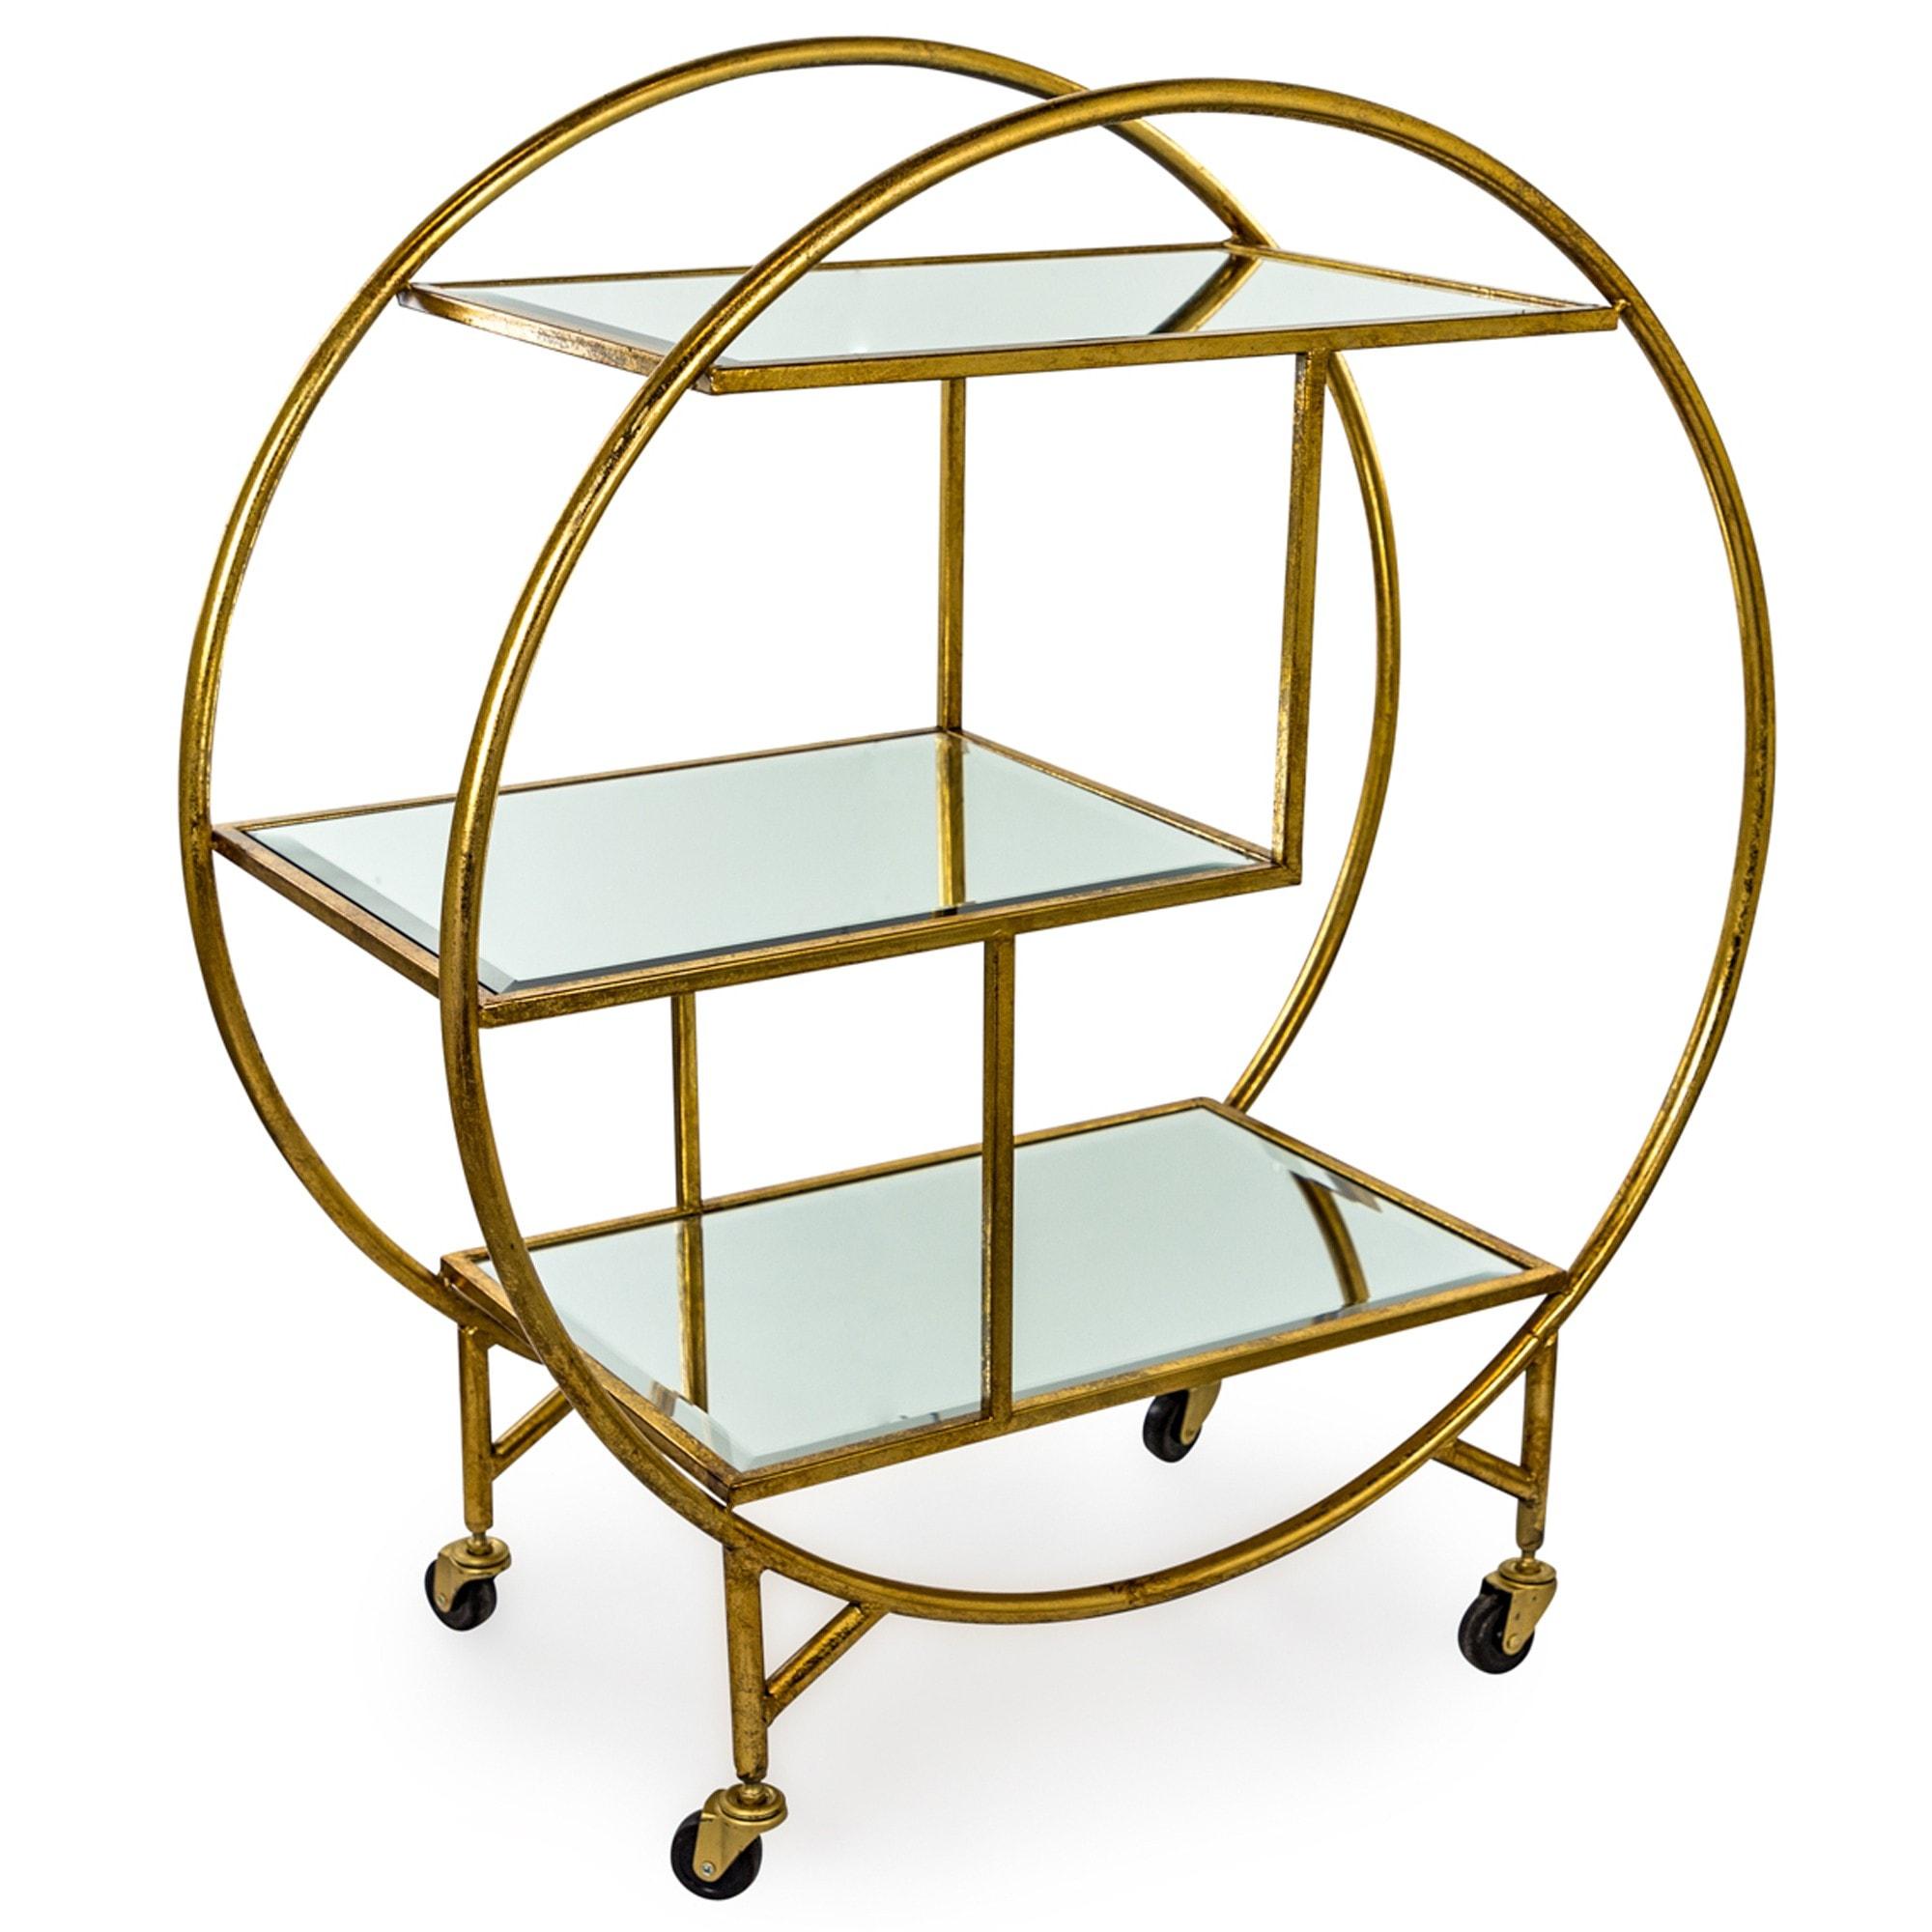 Antique Gold Bronze Leaf Metal Bar Trolley With Mirror Shelves Round Bar Cart Round Drinks Trolley